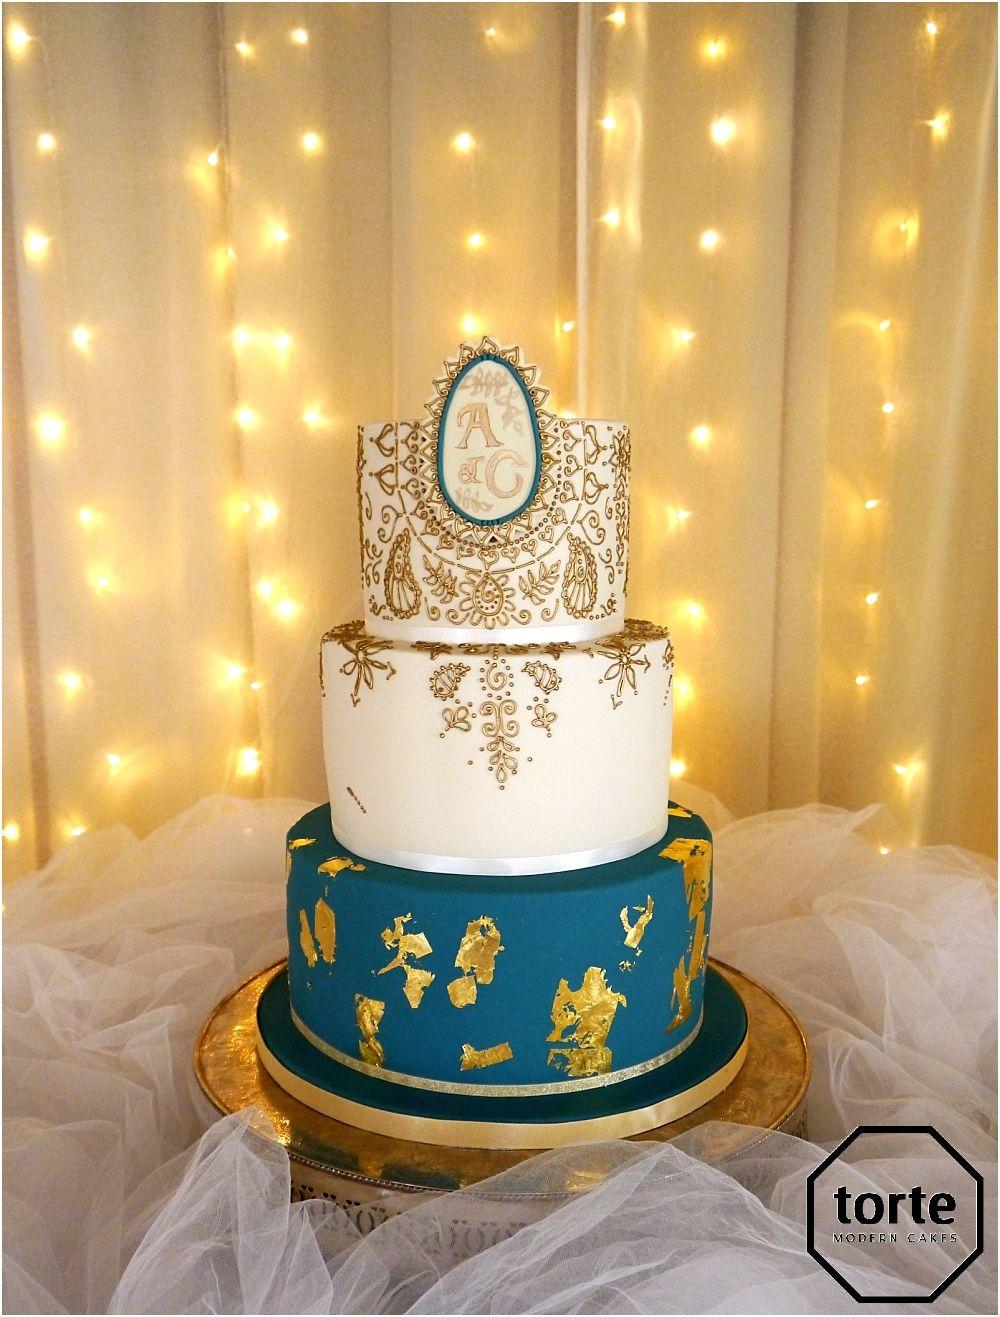 GOLD HENNA #wedding #cake #teal #henna #gold #piping #welshwedding ...